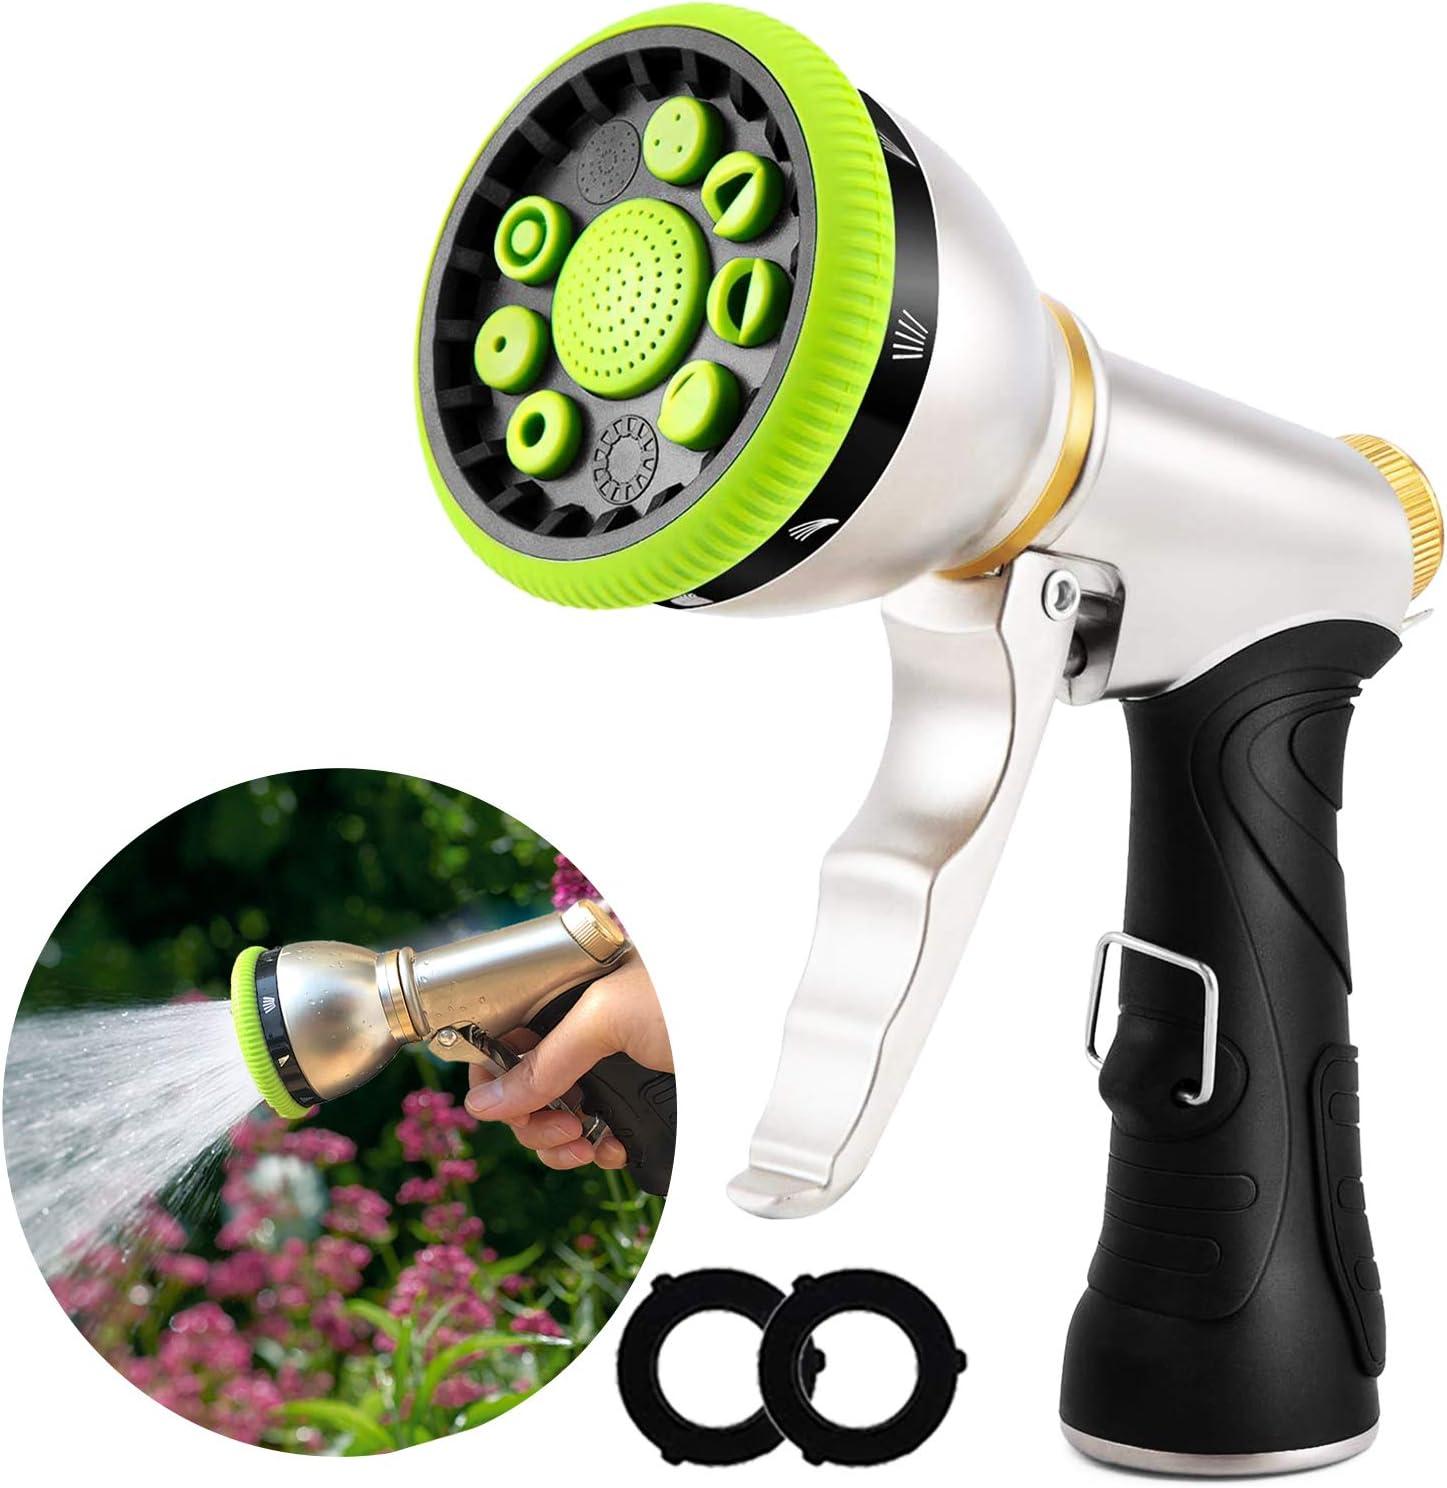 Hose Nozzle, Garden Hose Nozzle Sprayer High Pressure Jet Water Hose Nozzle Head Heavy Duty Metal for Garden Hose 9 Adjustable Spray Patterns